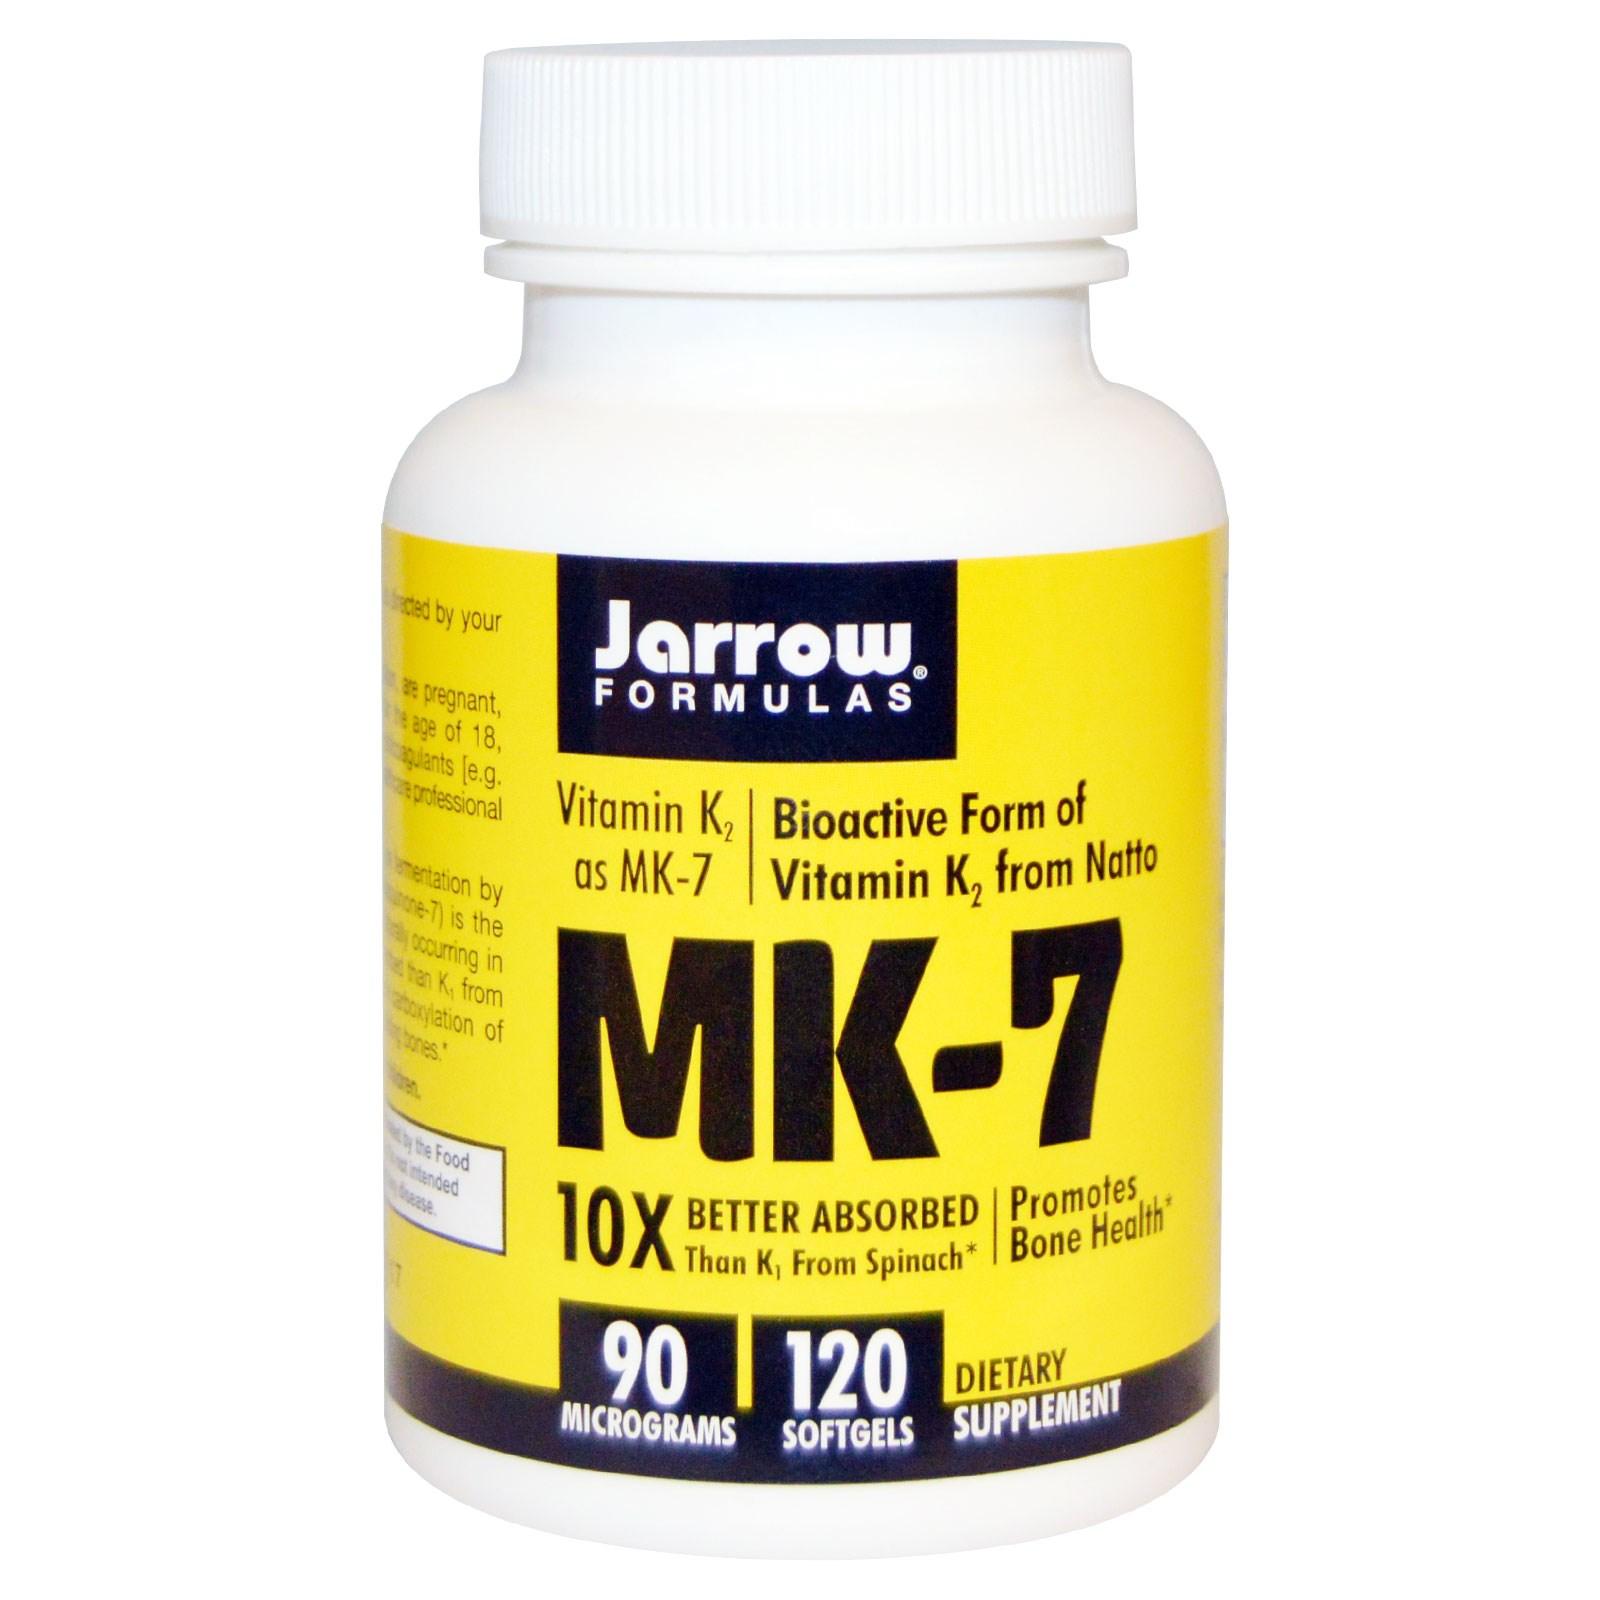 Image of MK-7 vitamina K2 come MK-7, 90 mcg (120 capsule) - Jarrow Formulas 0790011300076